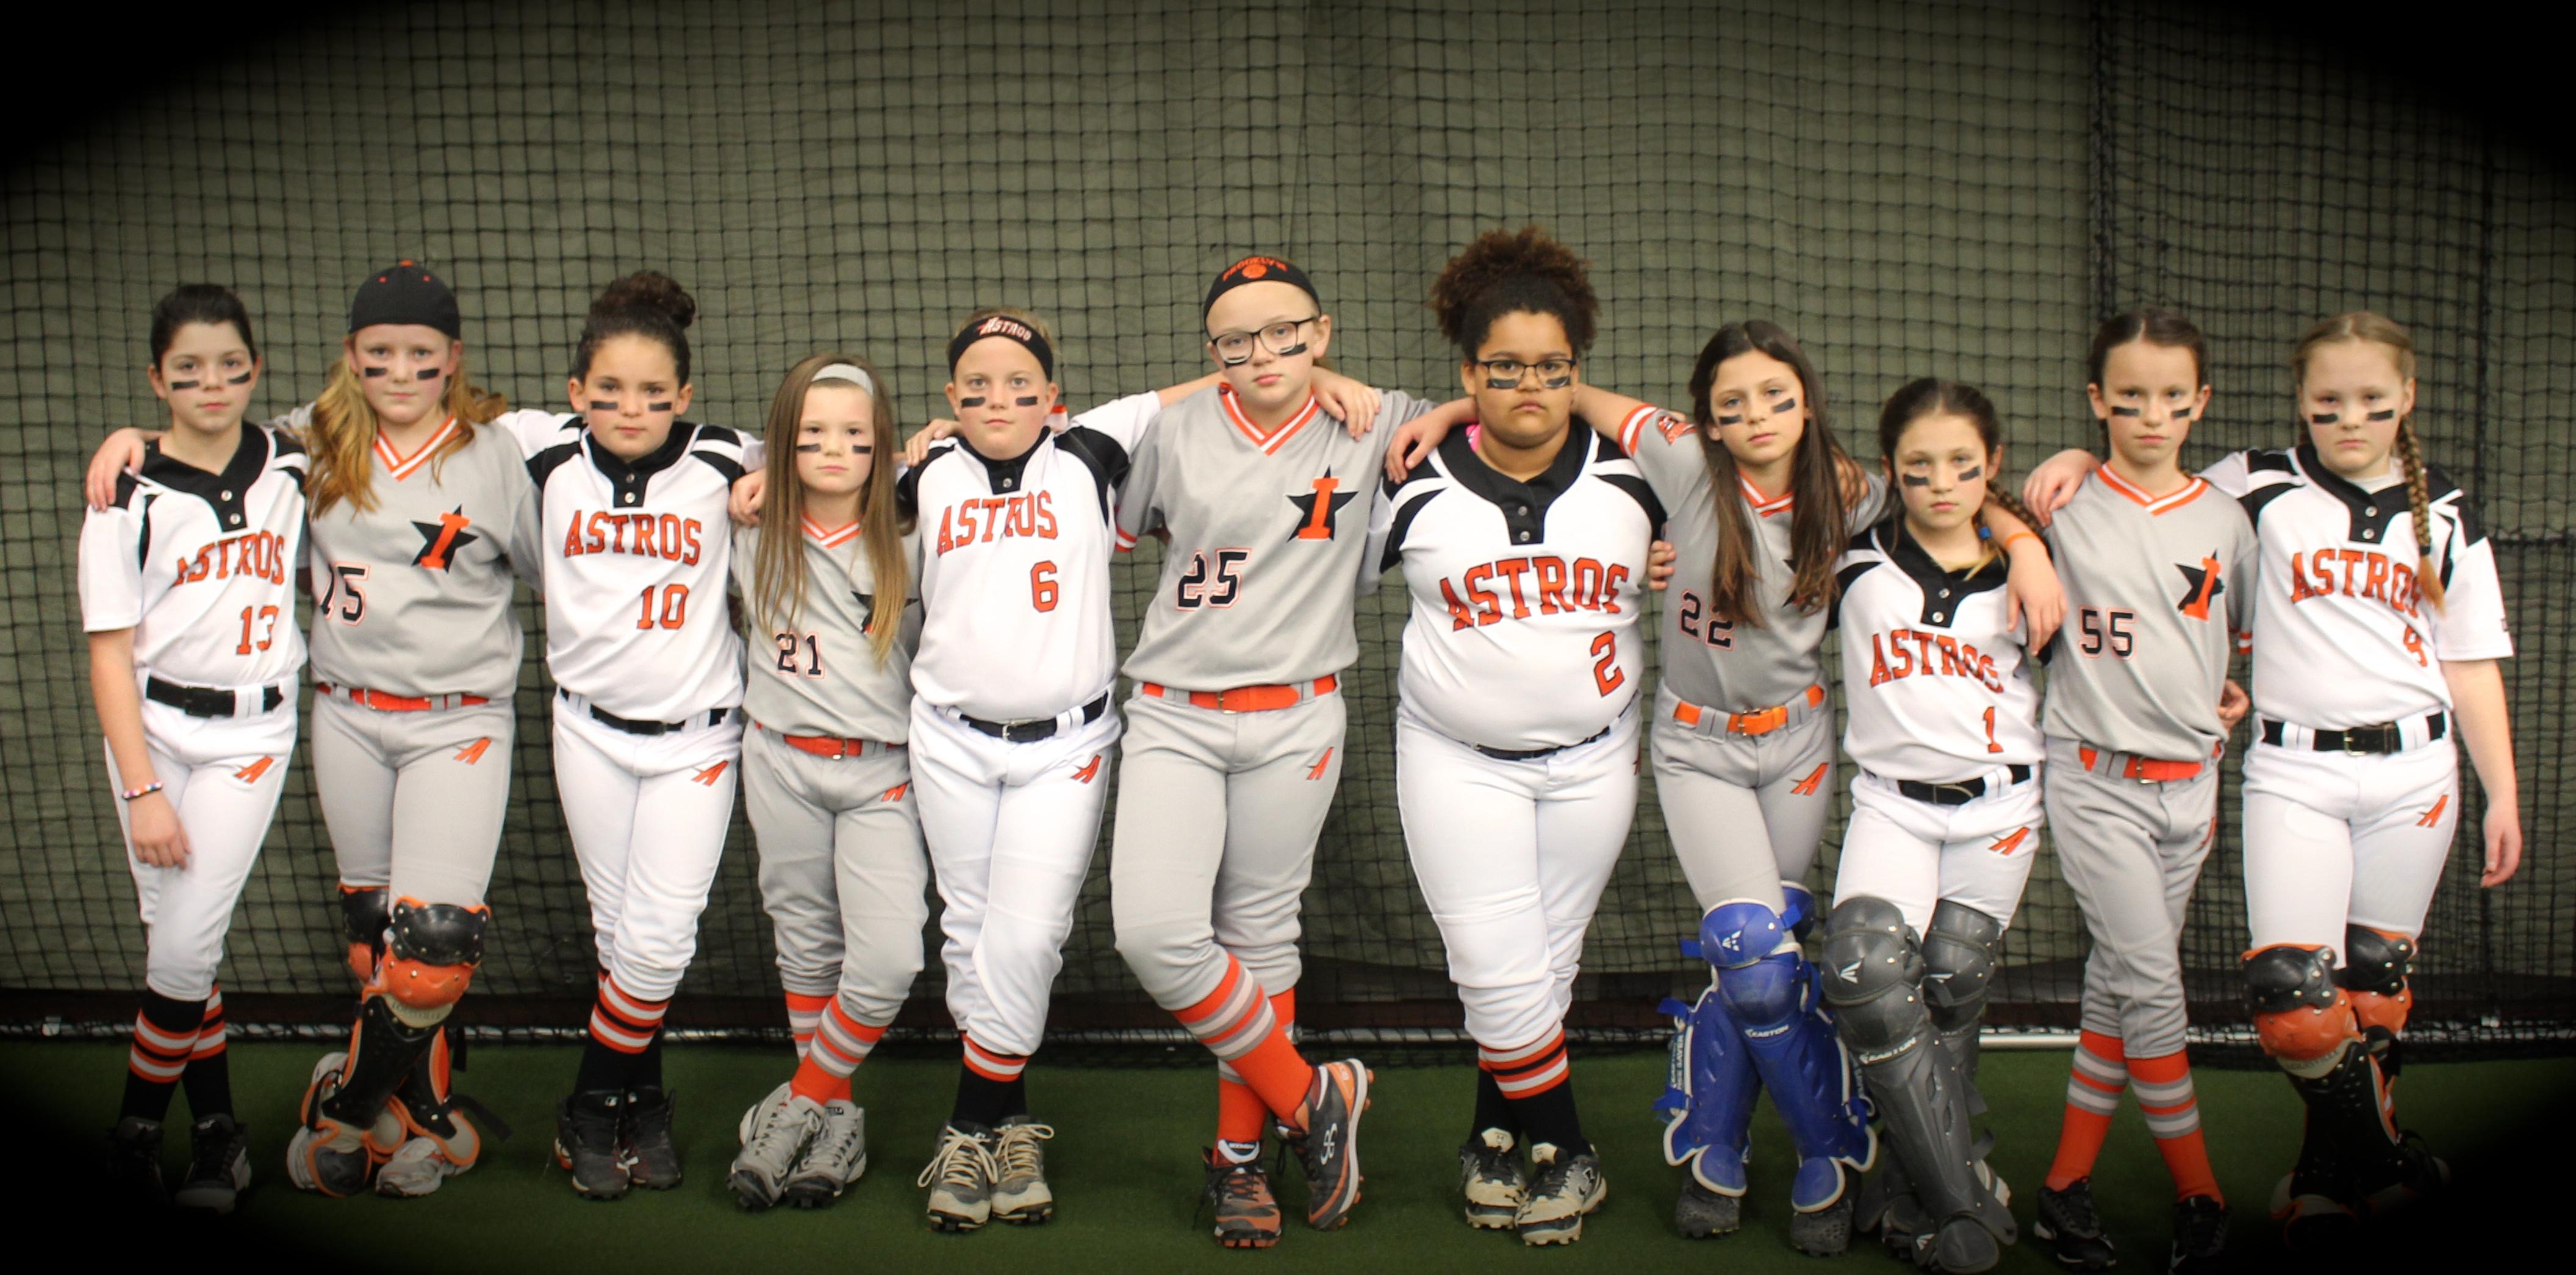 USSSA | Fastpitch Team: Indiana Astros 10u Orange